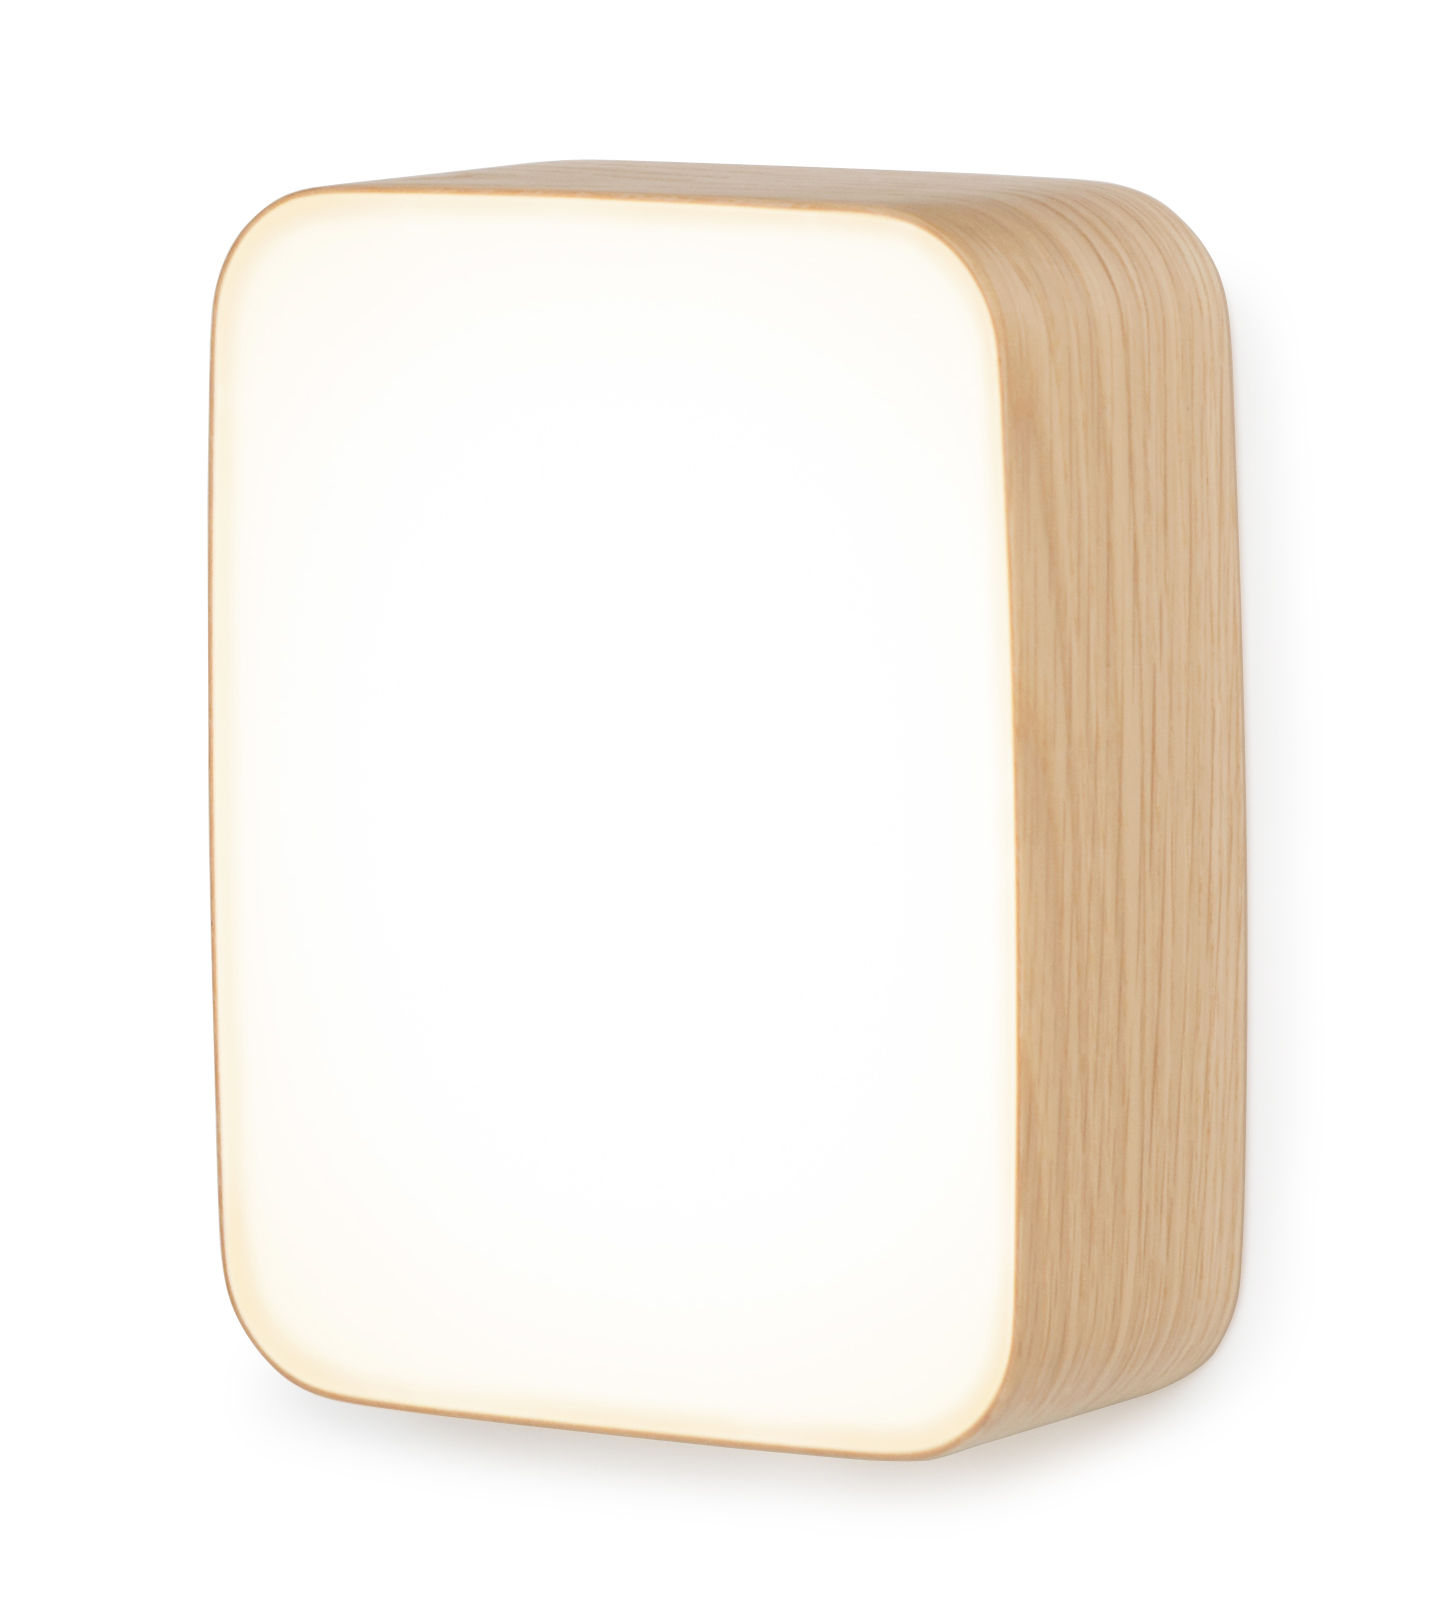 Luminaire - Appliques - Applique Cube Small / Plafonnier LED - 22 x 16 cm - Tunto - Small / Chêne - Polypropylène